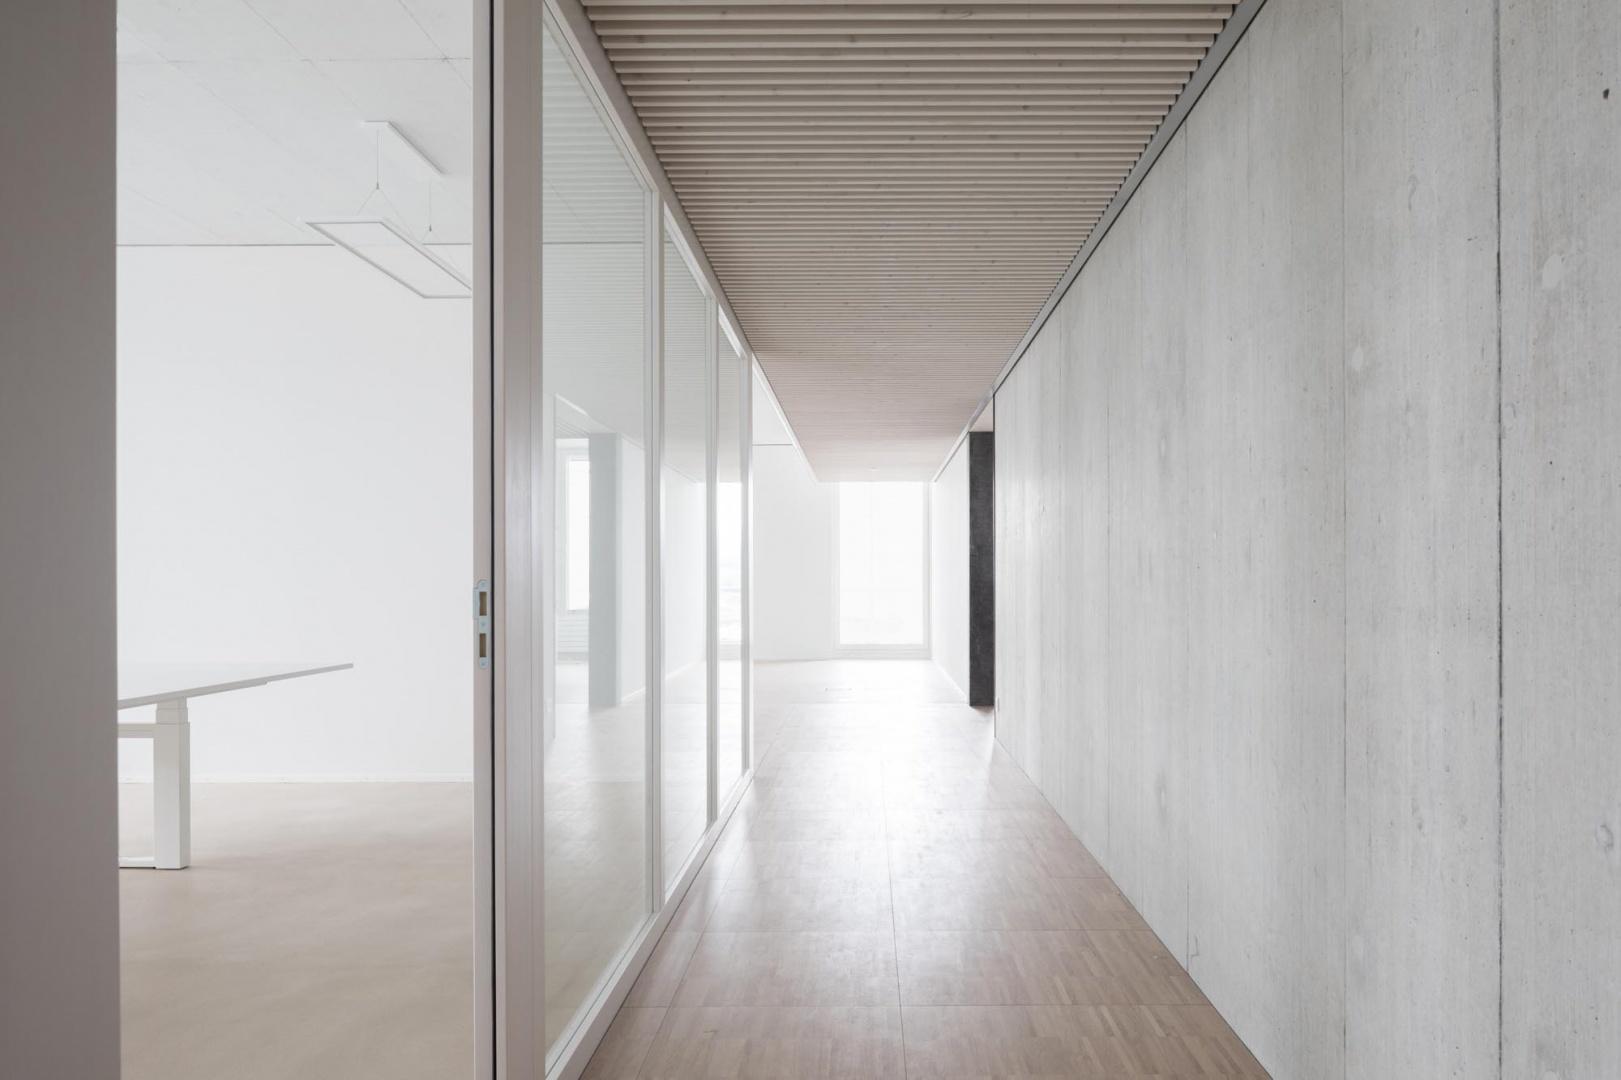 Korridor Bürogebäude 3-Plan © Architektur: Bob Gysin Partner, Zürich; Fotografie: Dominique Marc Wehrli, Winterthur